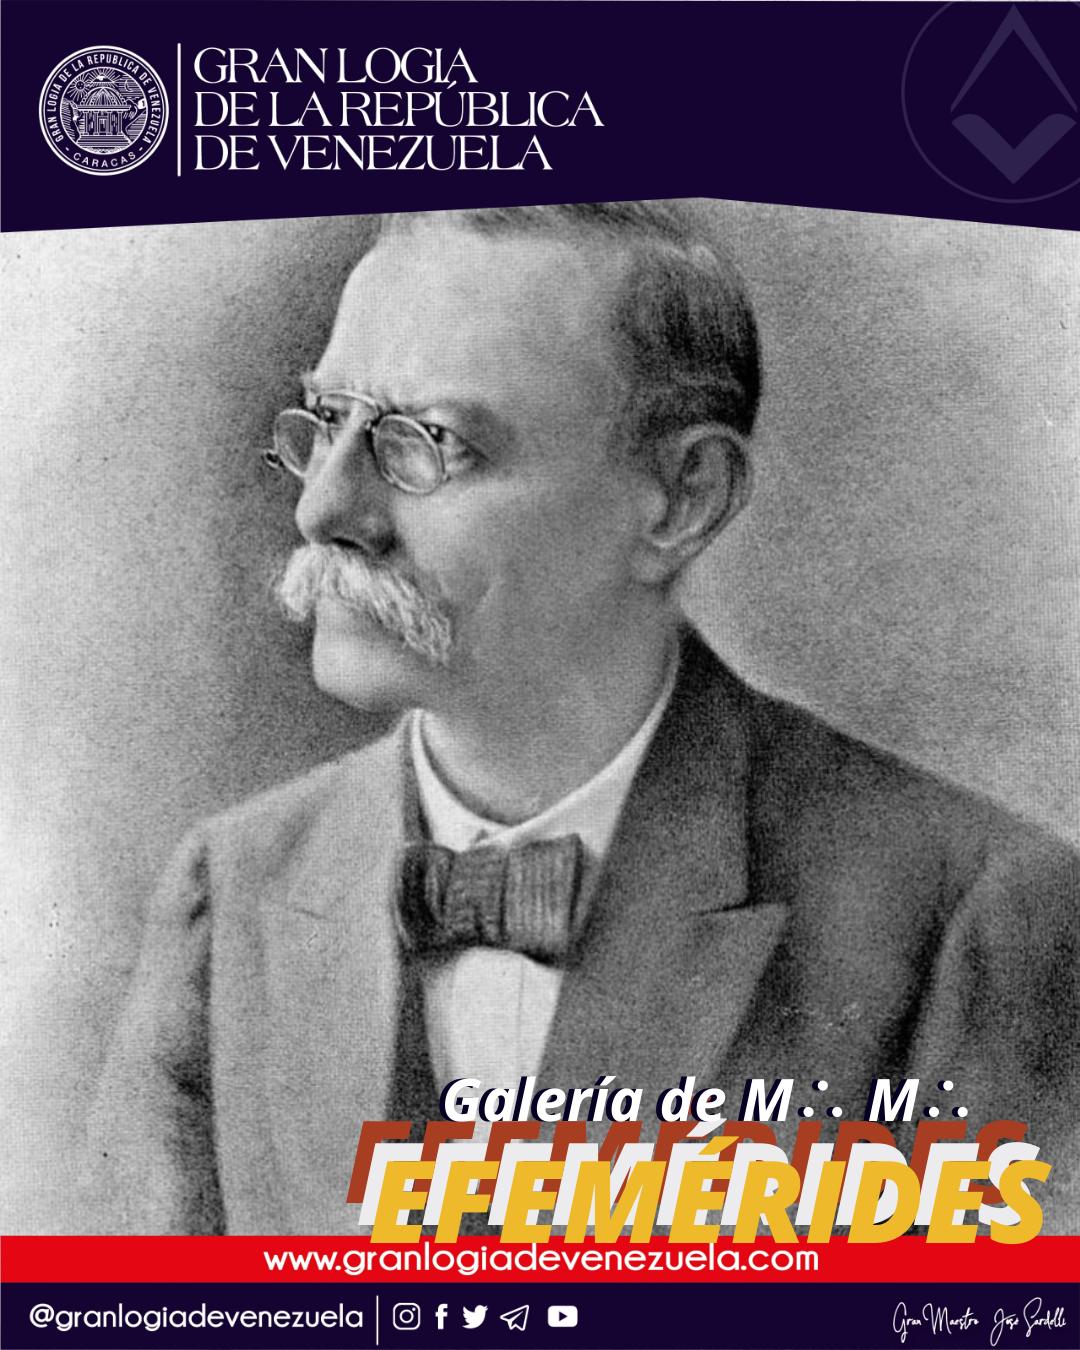 A L∴ G∴ D∴ G∴ A∴ D∴ U∴S∴ F∴ U∴ / Neurosis de hombres célebres de Venezuela / Q∴ H∴ Lisandro Alvarado.